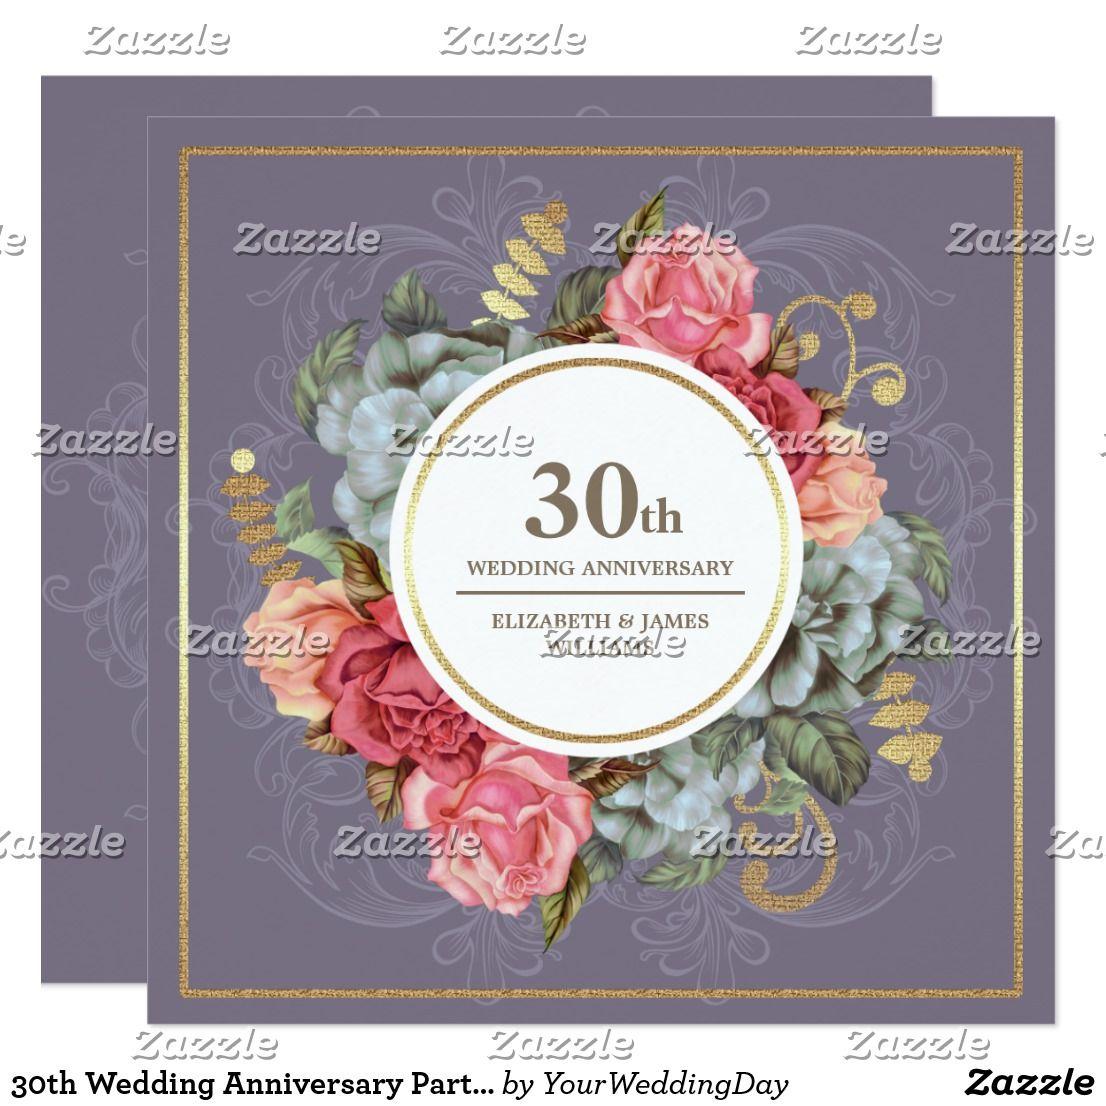 30th Wedding Anniversary Party Invitations Zazzle Com Wedding Anniversary Cards 25th Wedding Anniversary Party 60th Wedding Anniversary Party